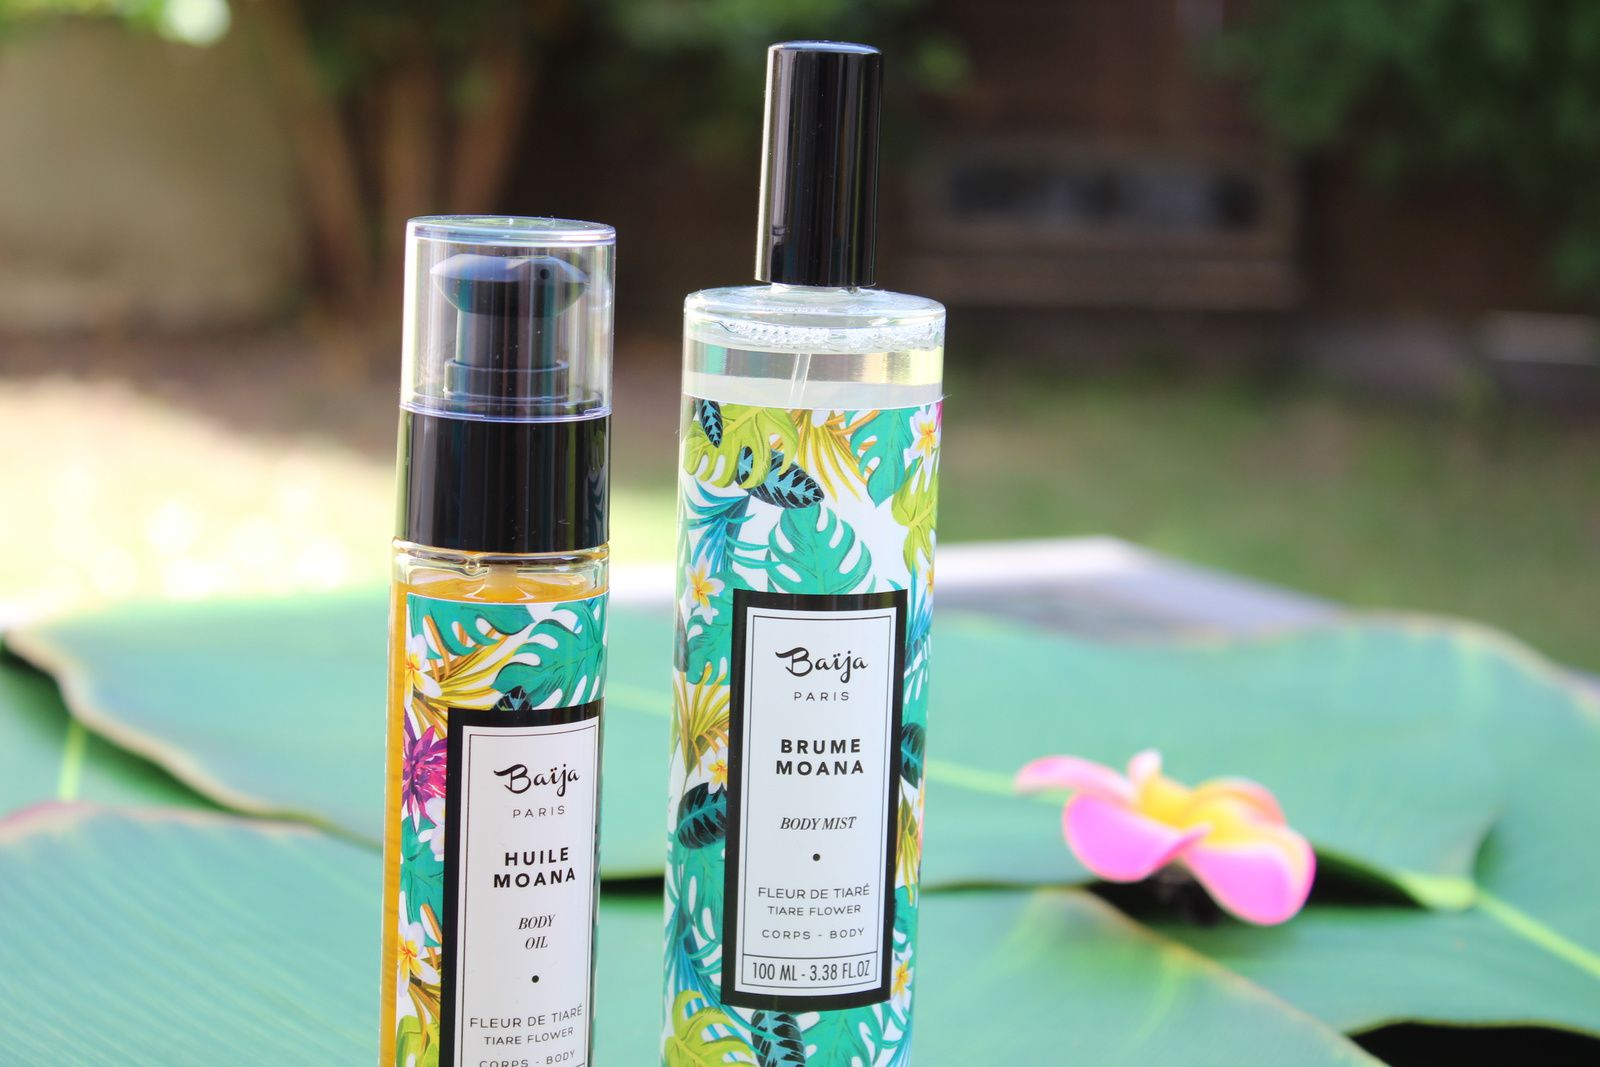 Brume parfumée et huile de soin Moana de Baïja